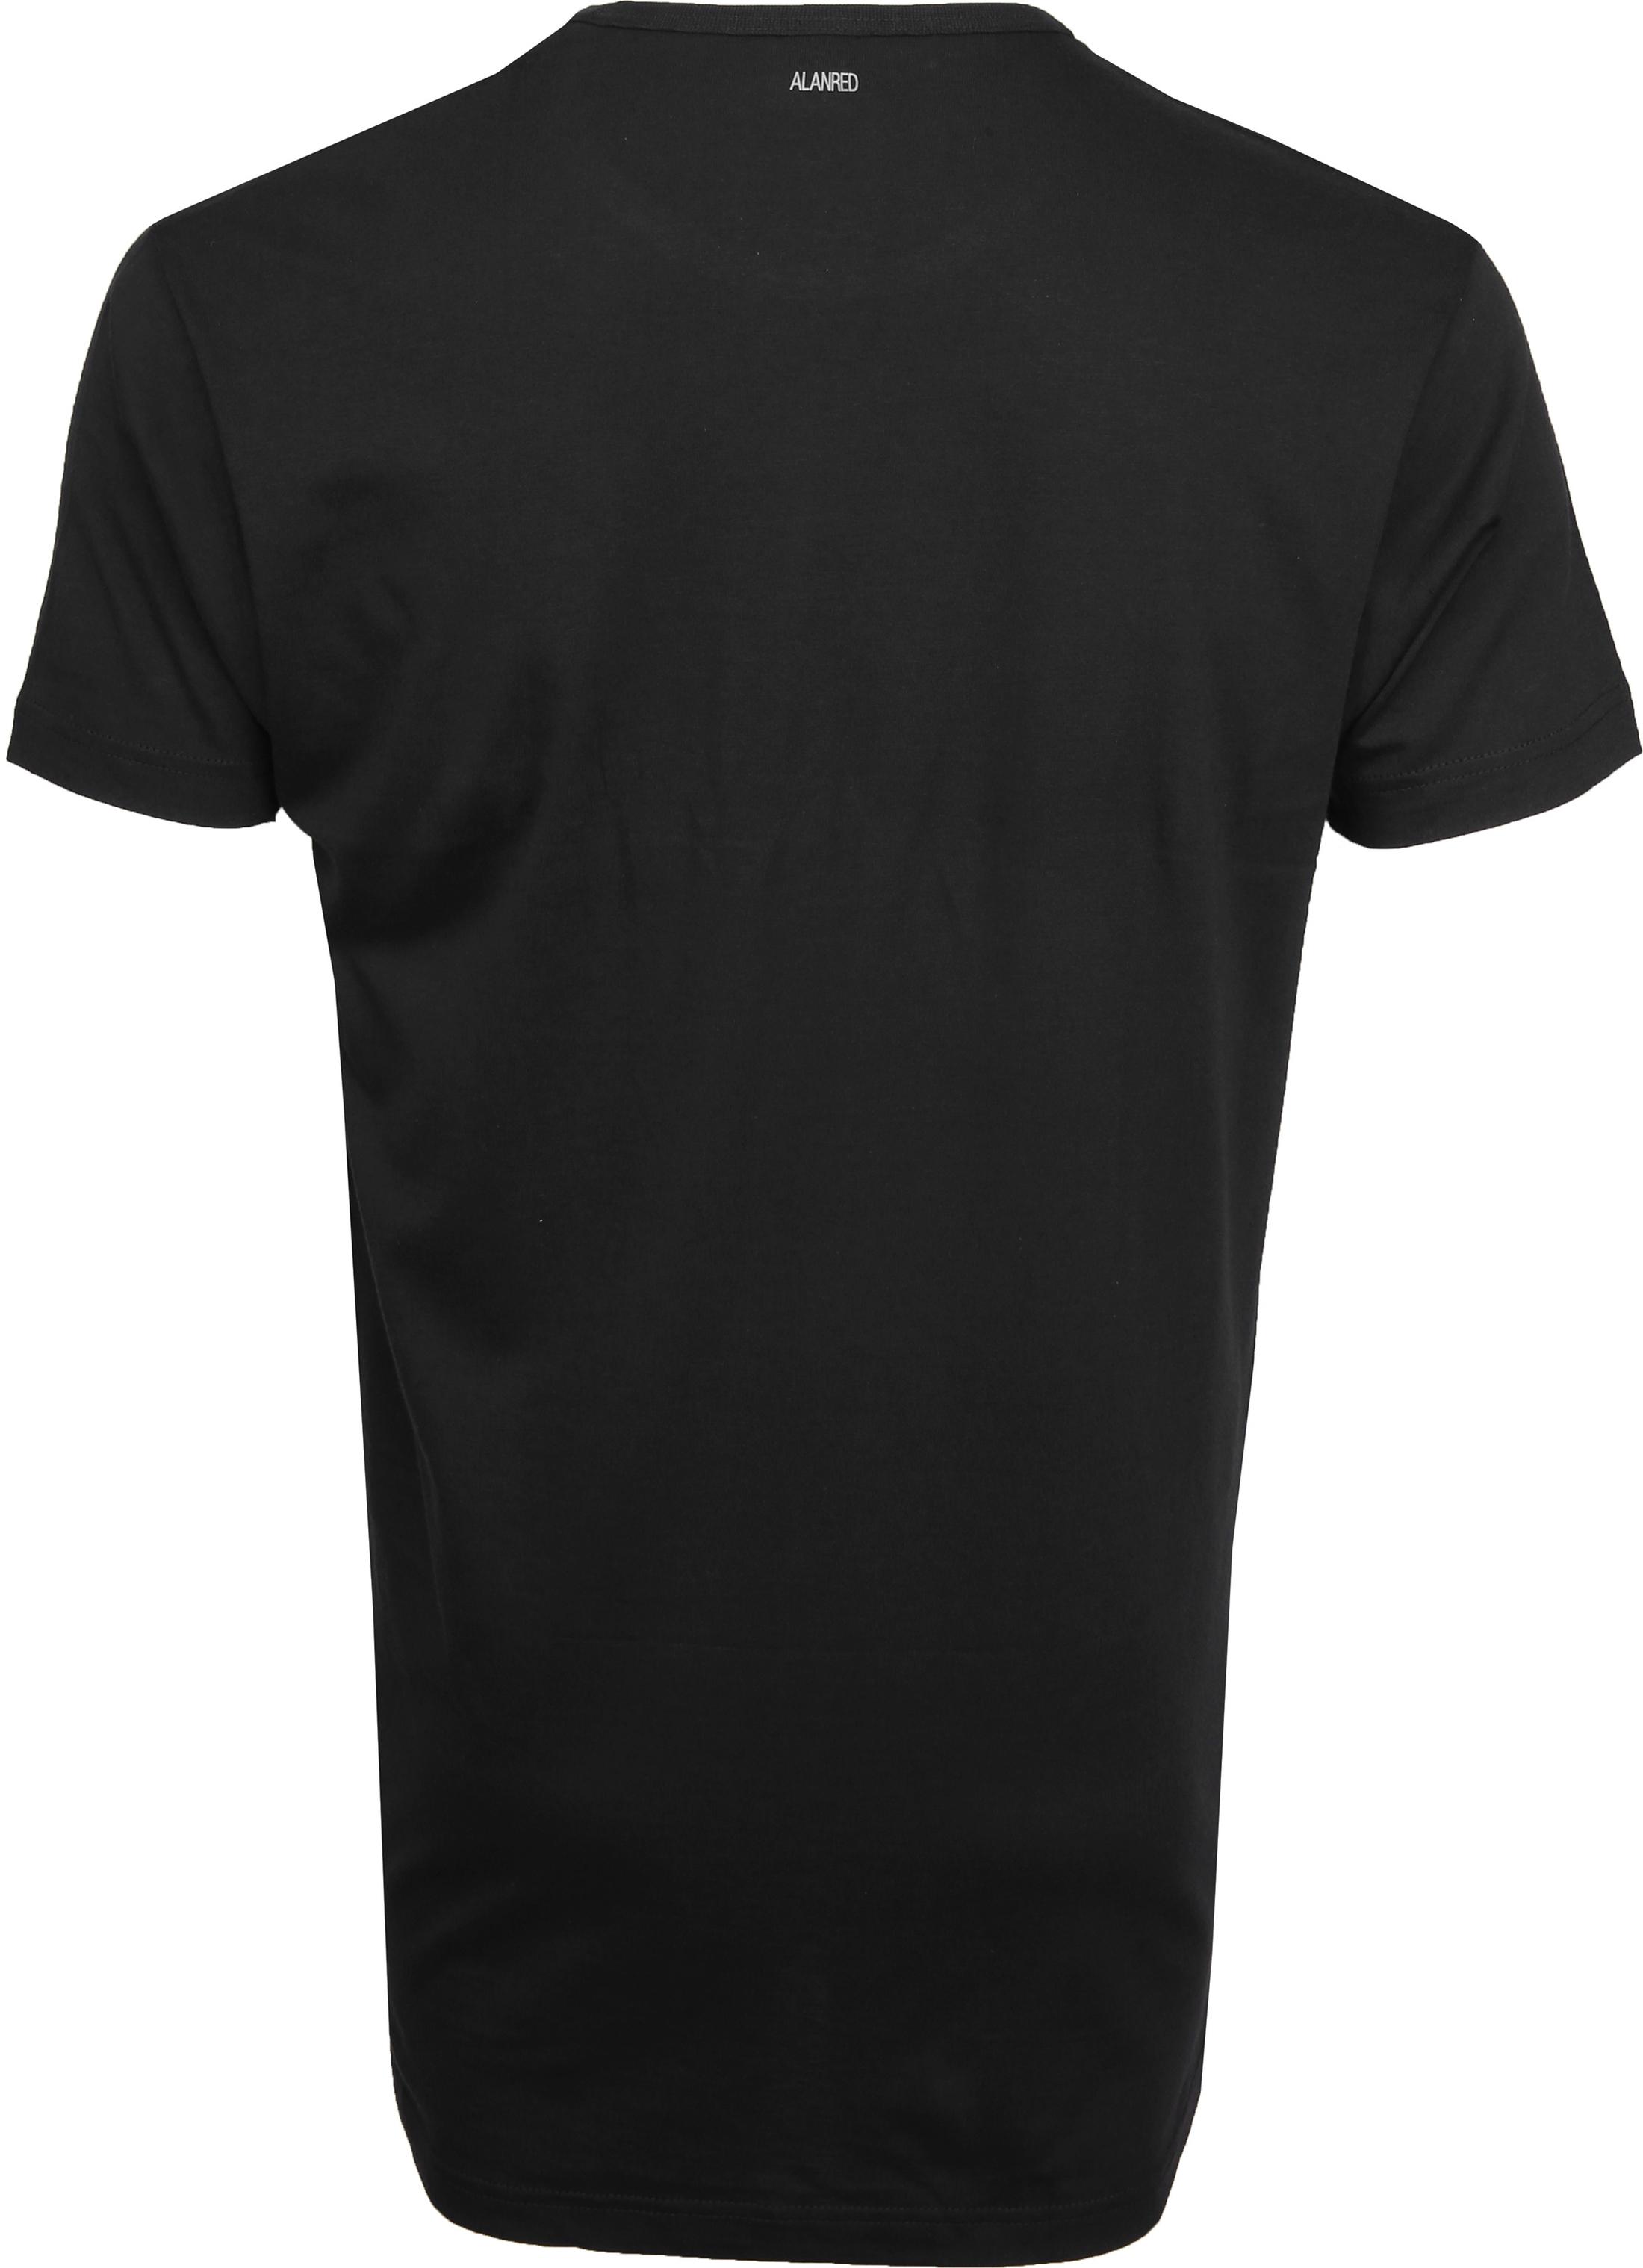 Alan Red Derby Extra Lang T-Shirt Zwart (2-Pack)